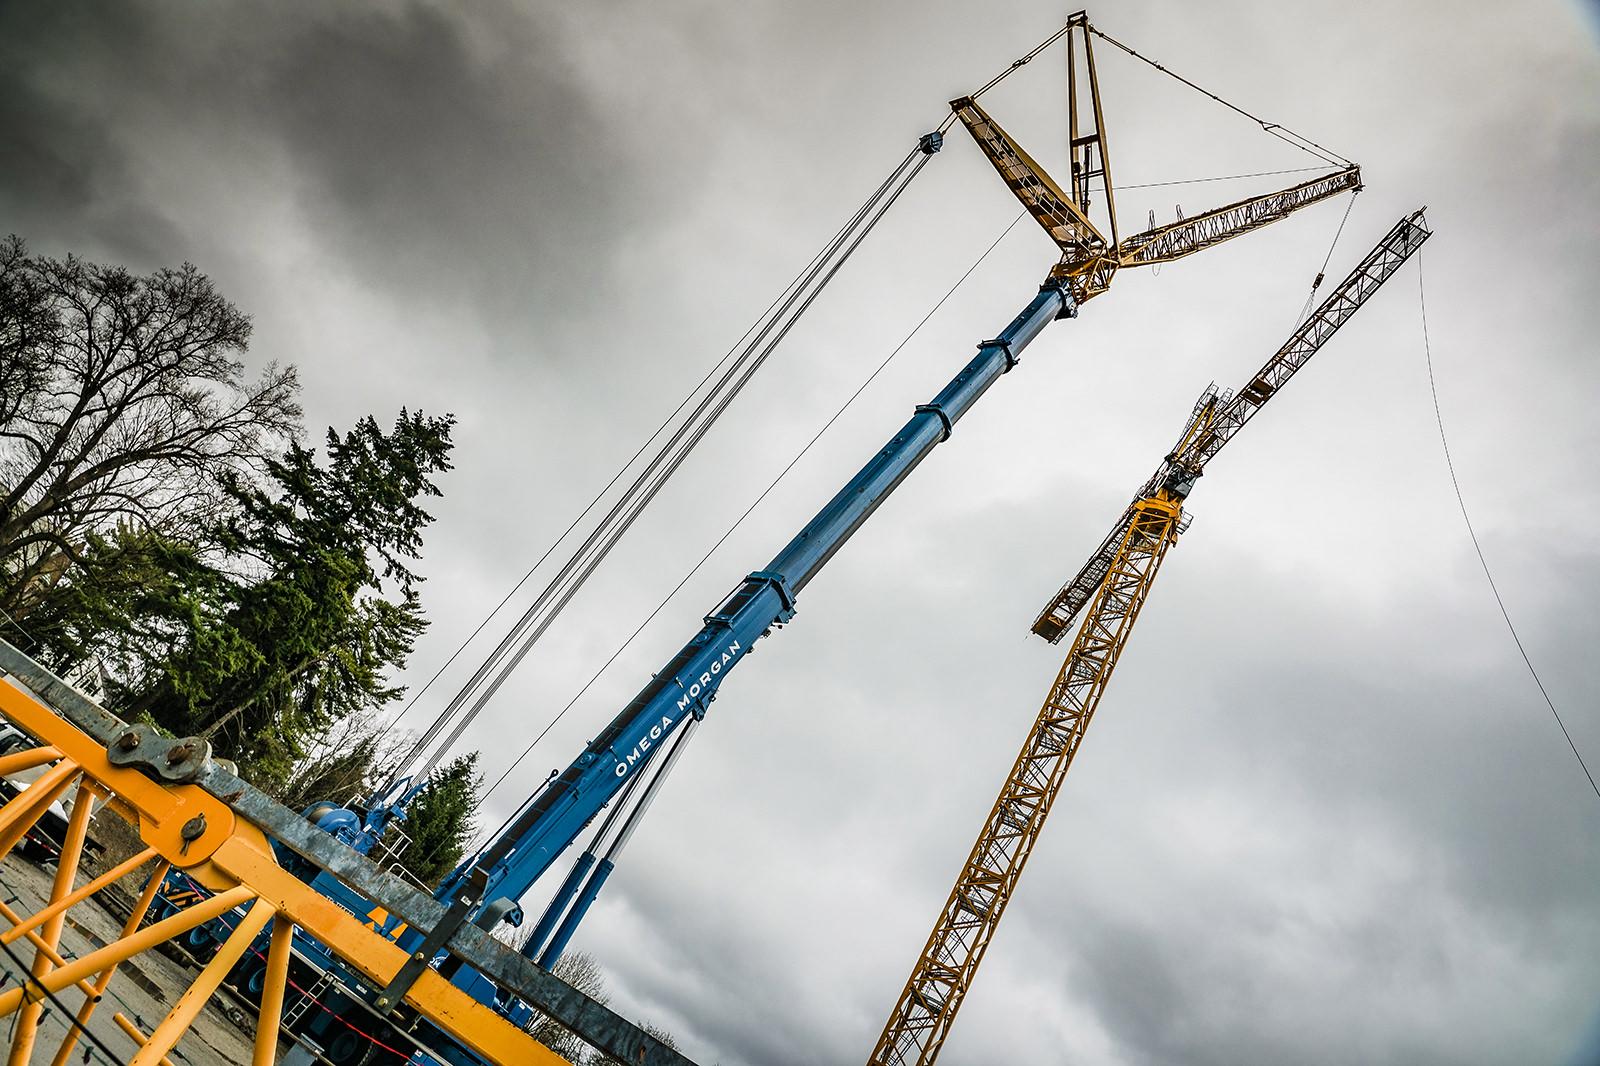 485 ton Liebherr placing inner jib of tower crane